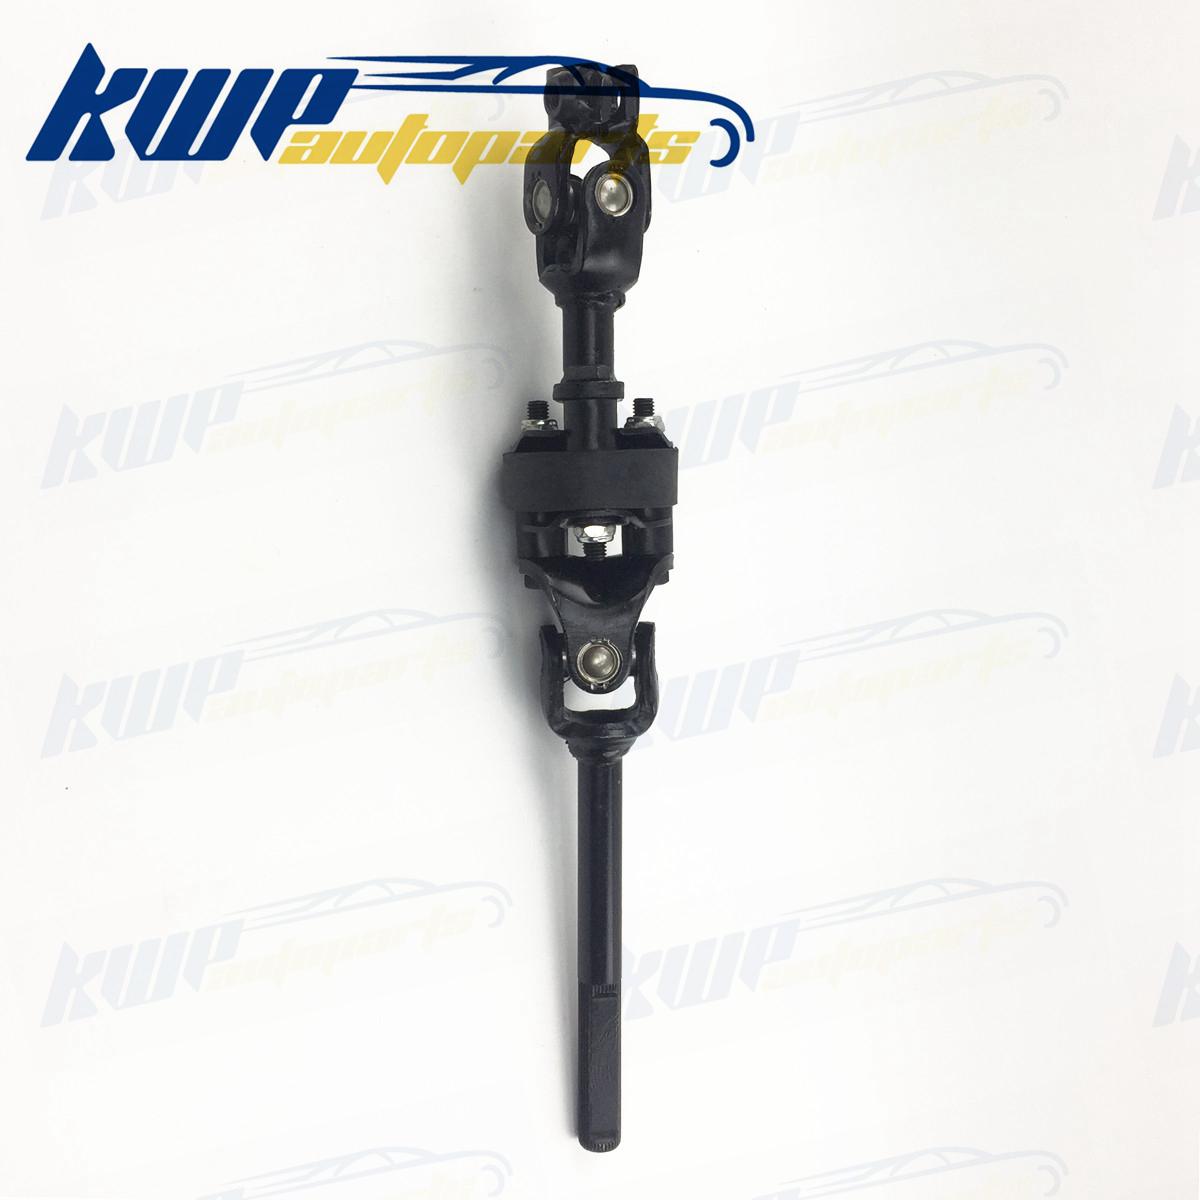 Lower Intermediate Steering Shaft w/ Coupler for 99-05 Suzuki Grand Vitara 99-04 Suzuki Vitara #48220-65D60